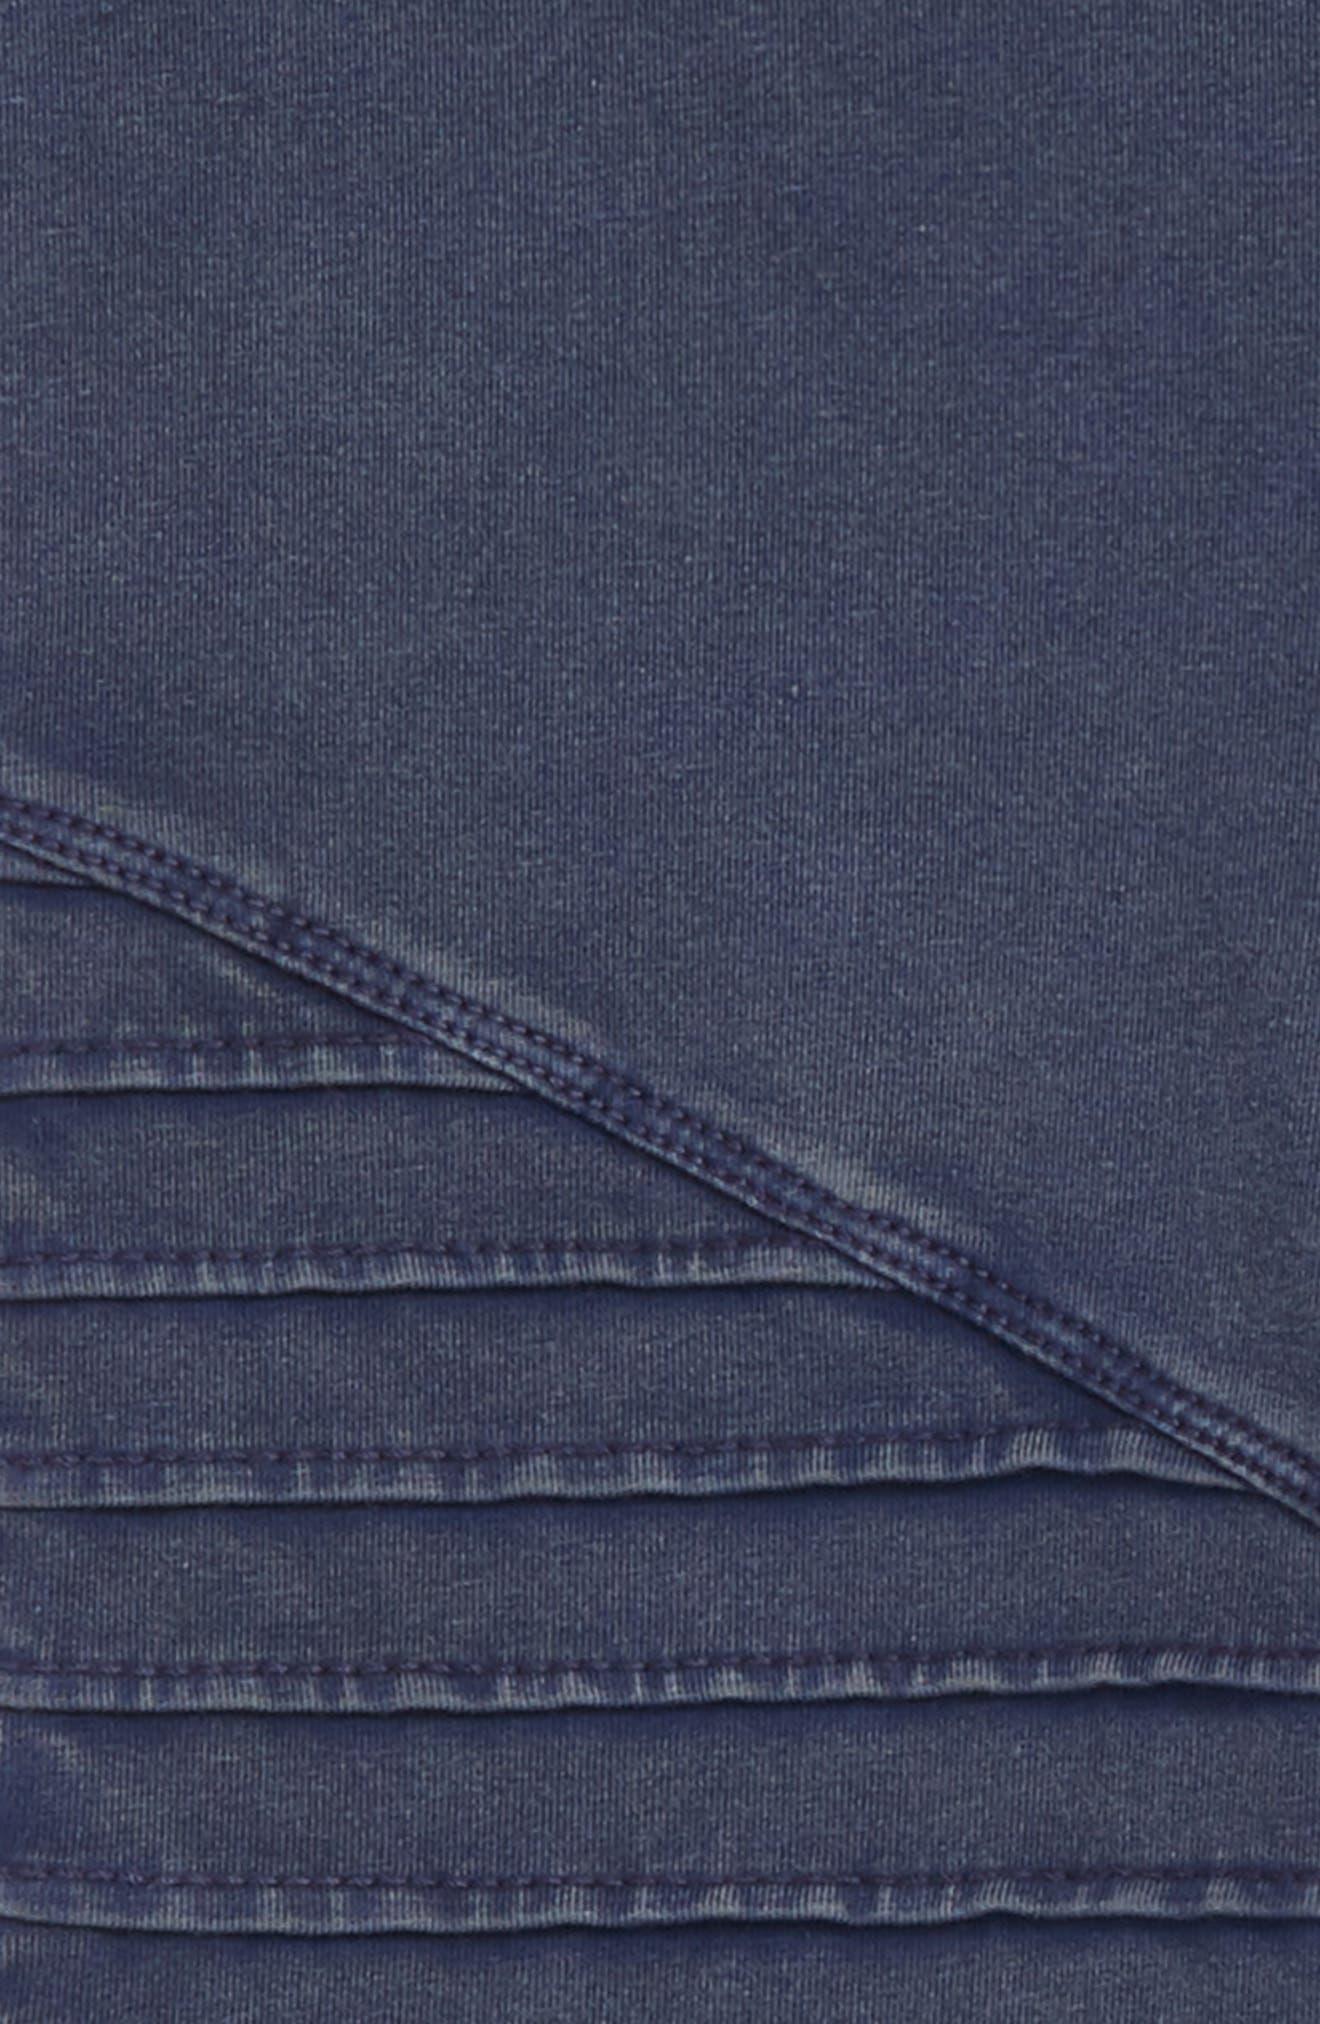 High Waist Moto Pants,                             Alternate thumbnail 2, color,                             NAVY PEACOAT WASH